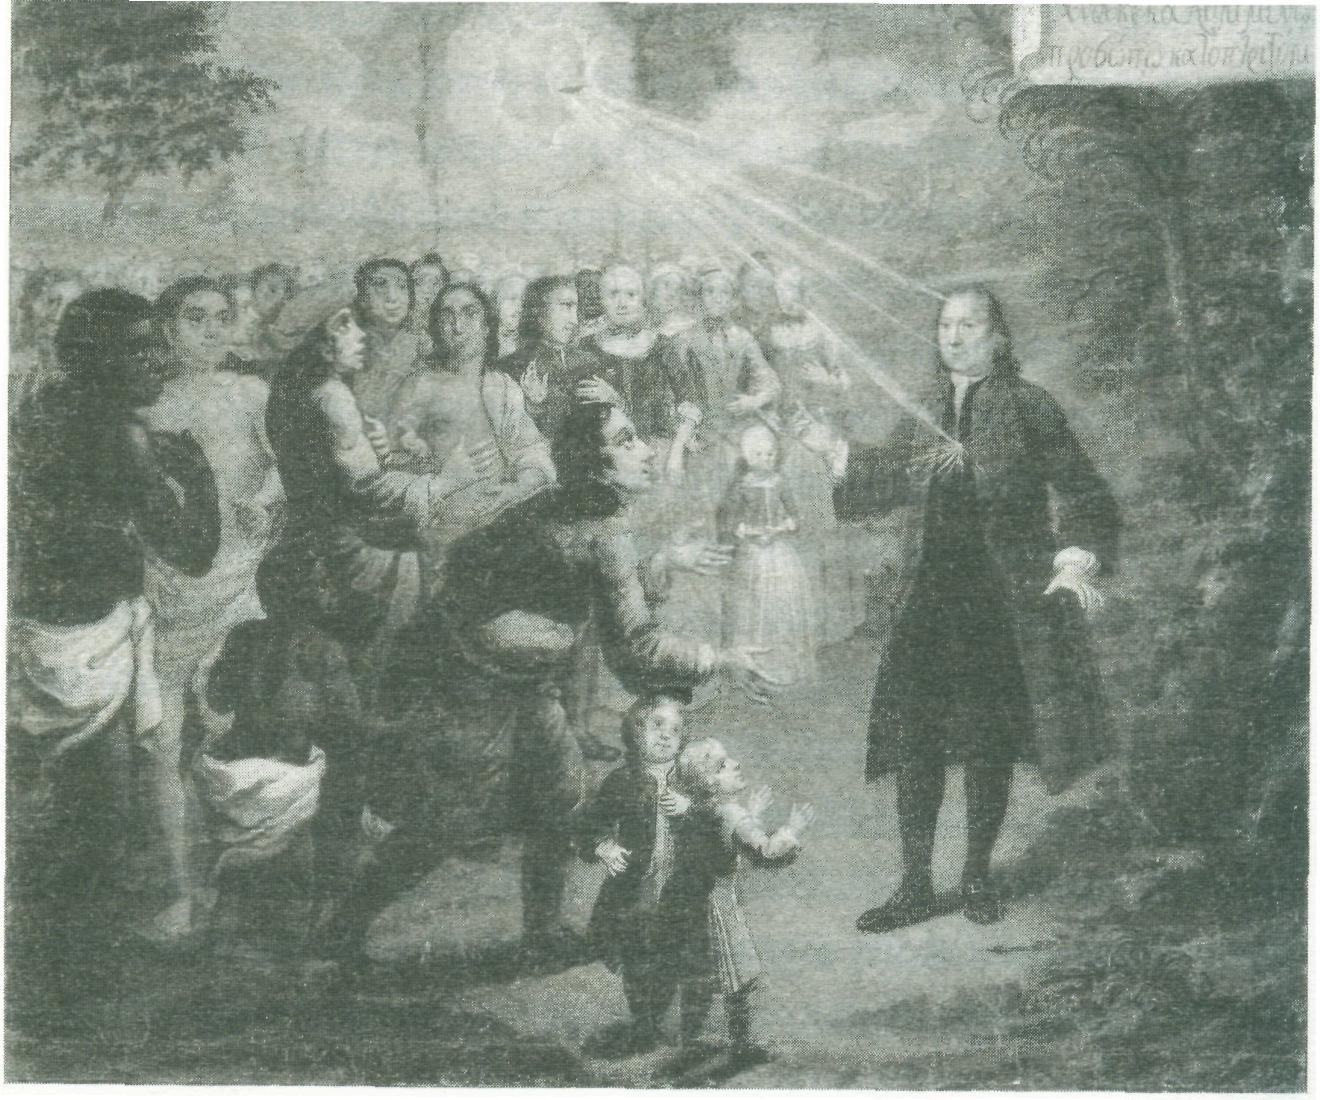 Greve Zinzendorf, herrnhutismens grundare, predikar